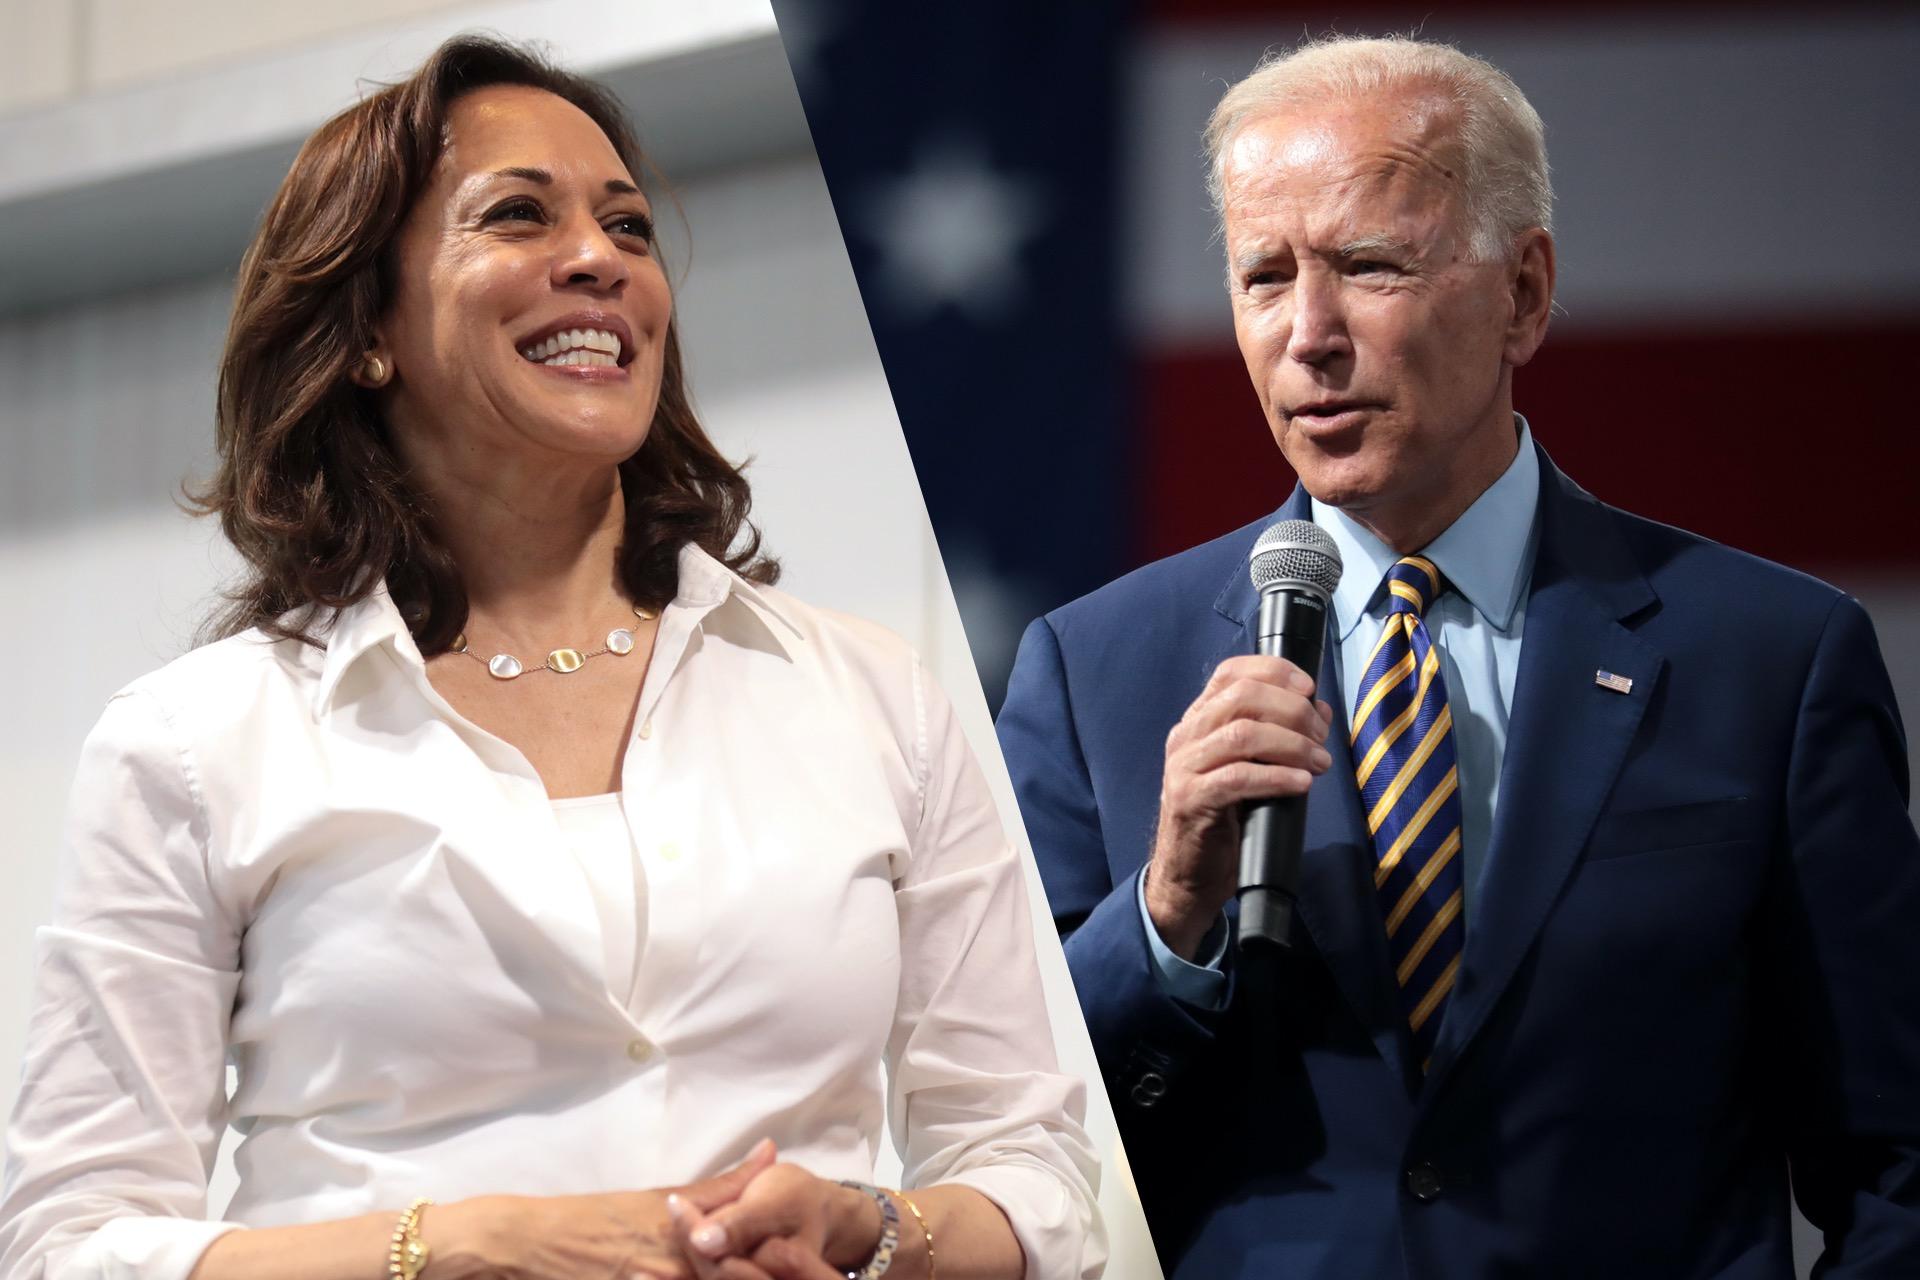 Bidens choice of Kamala Harris as VP candidate